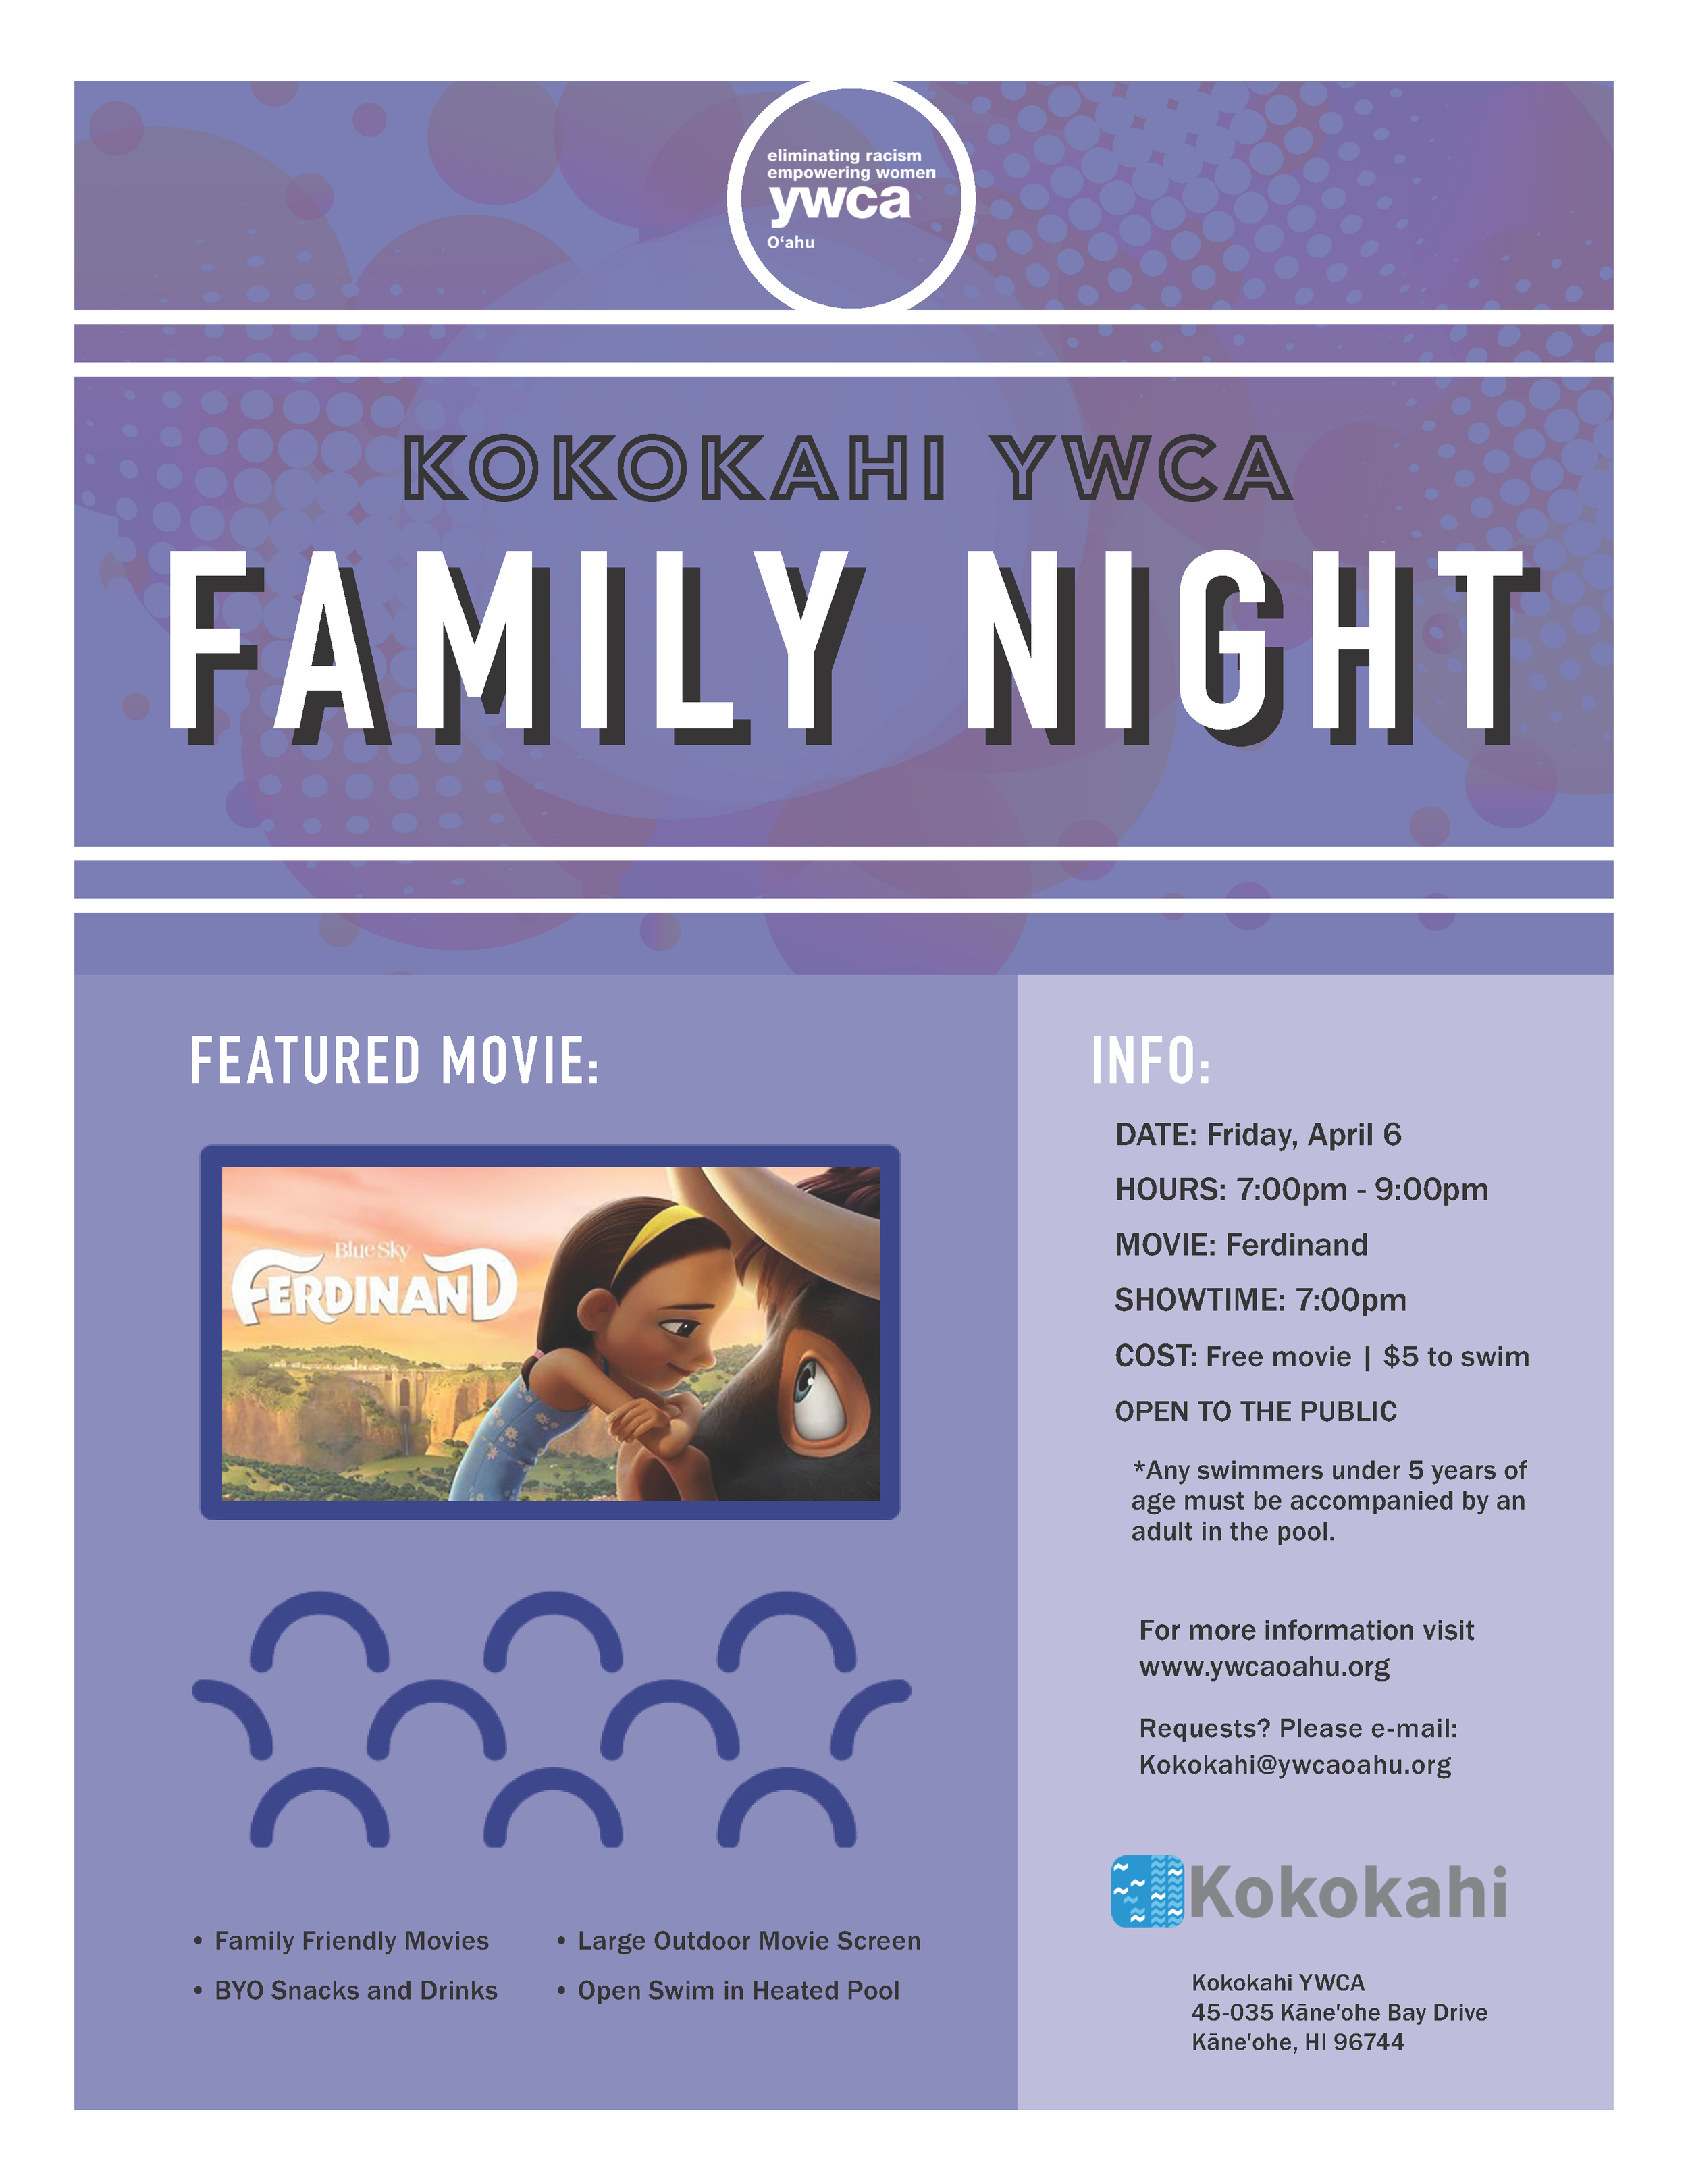 Kokokahi Family Night flyer April 2018 (2).png